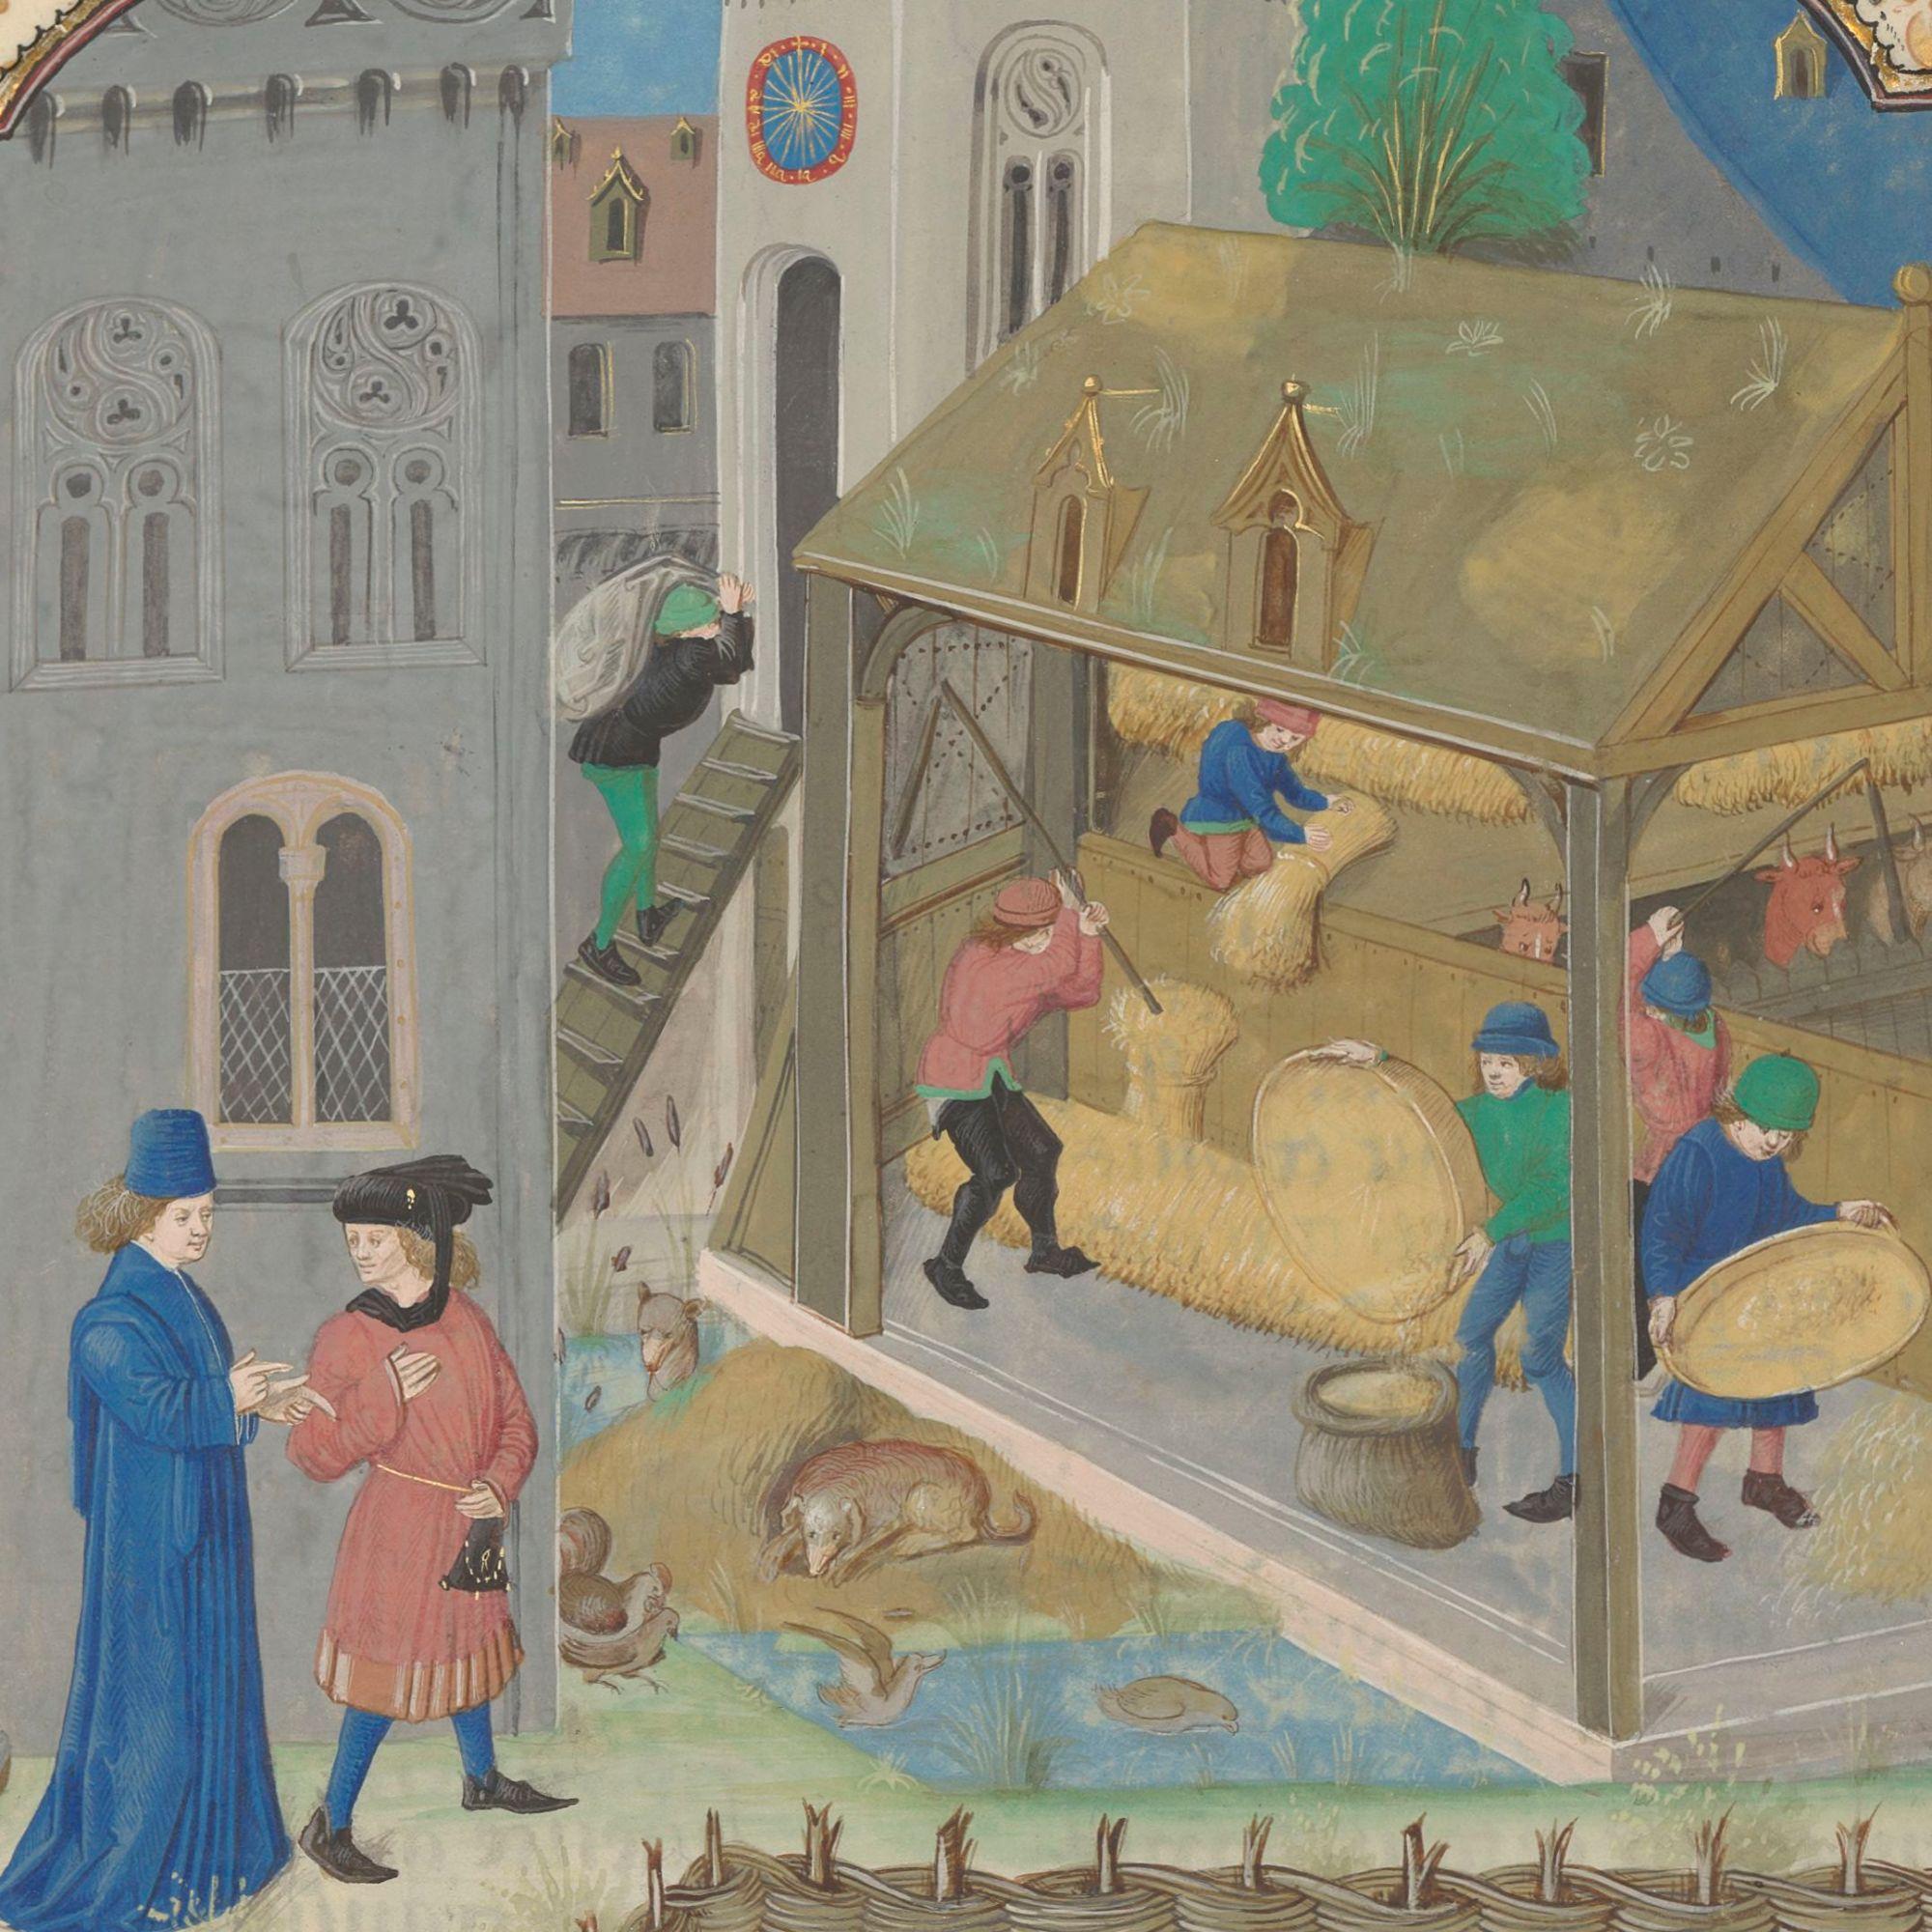 Urban Gardens in the Middle Ages. Illuminated Medieval Manuscript. Illumination.